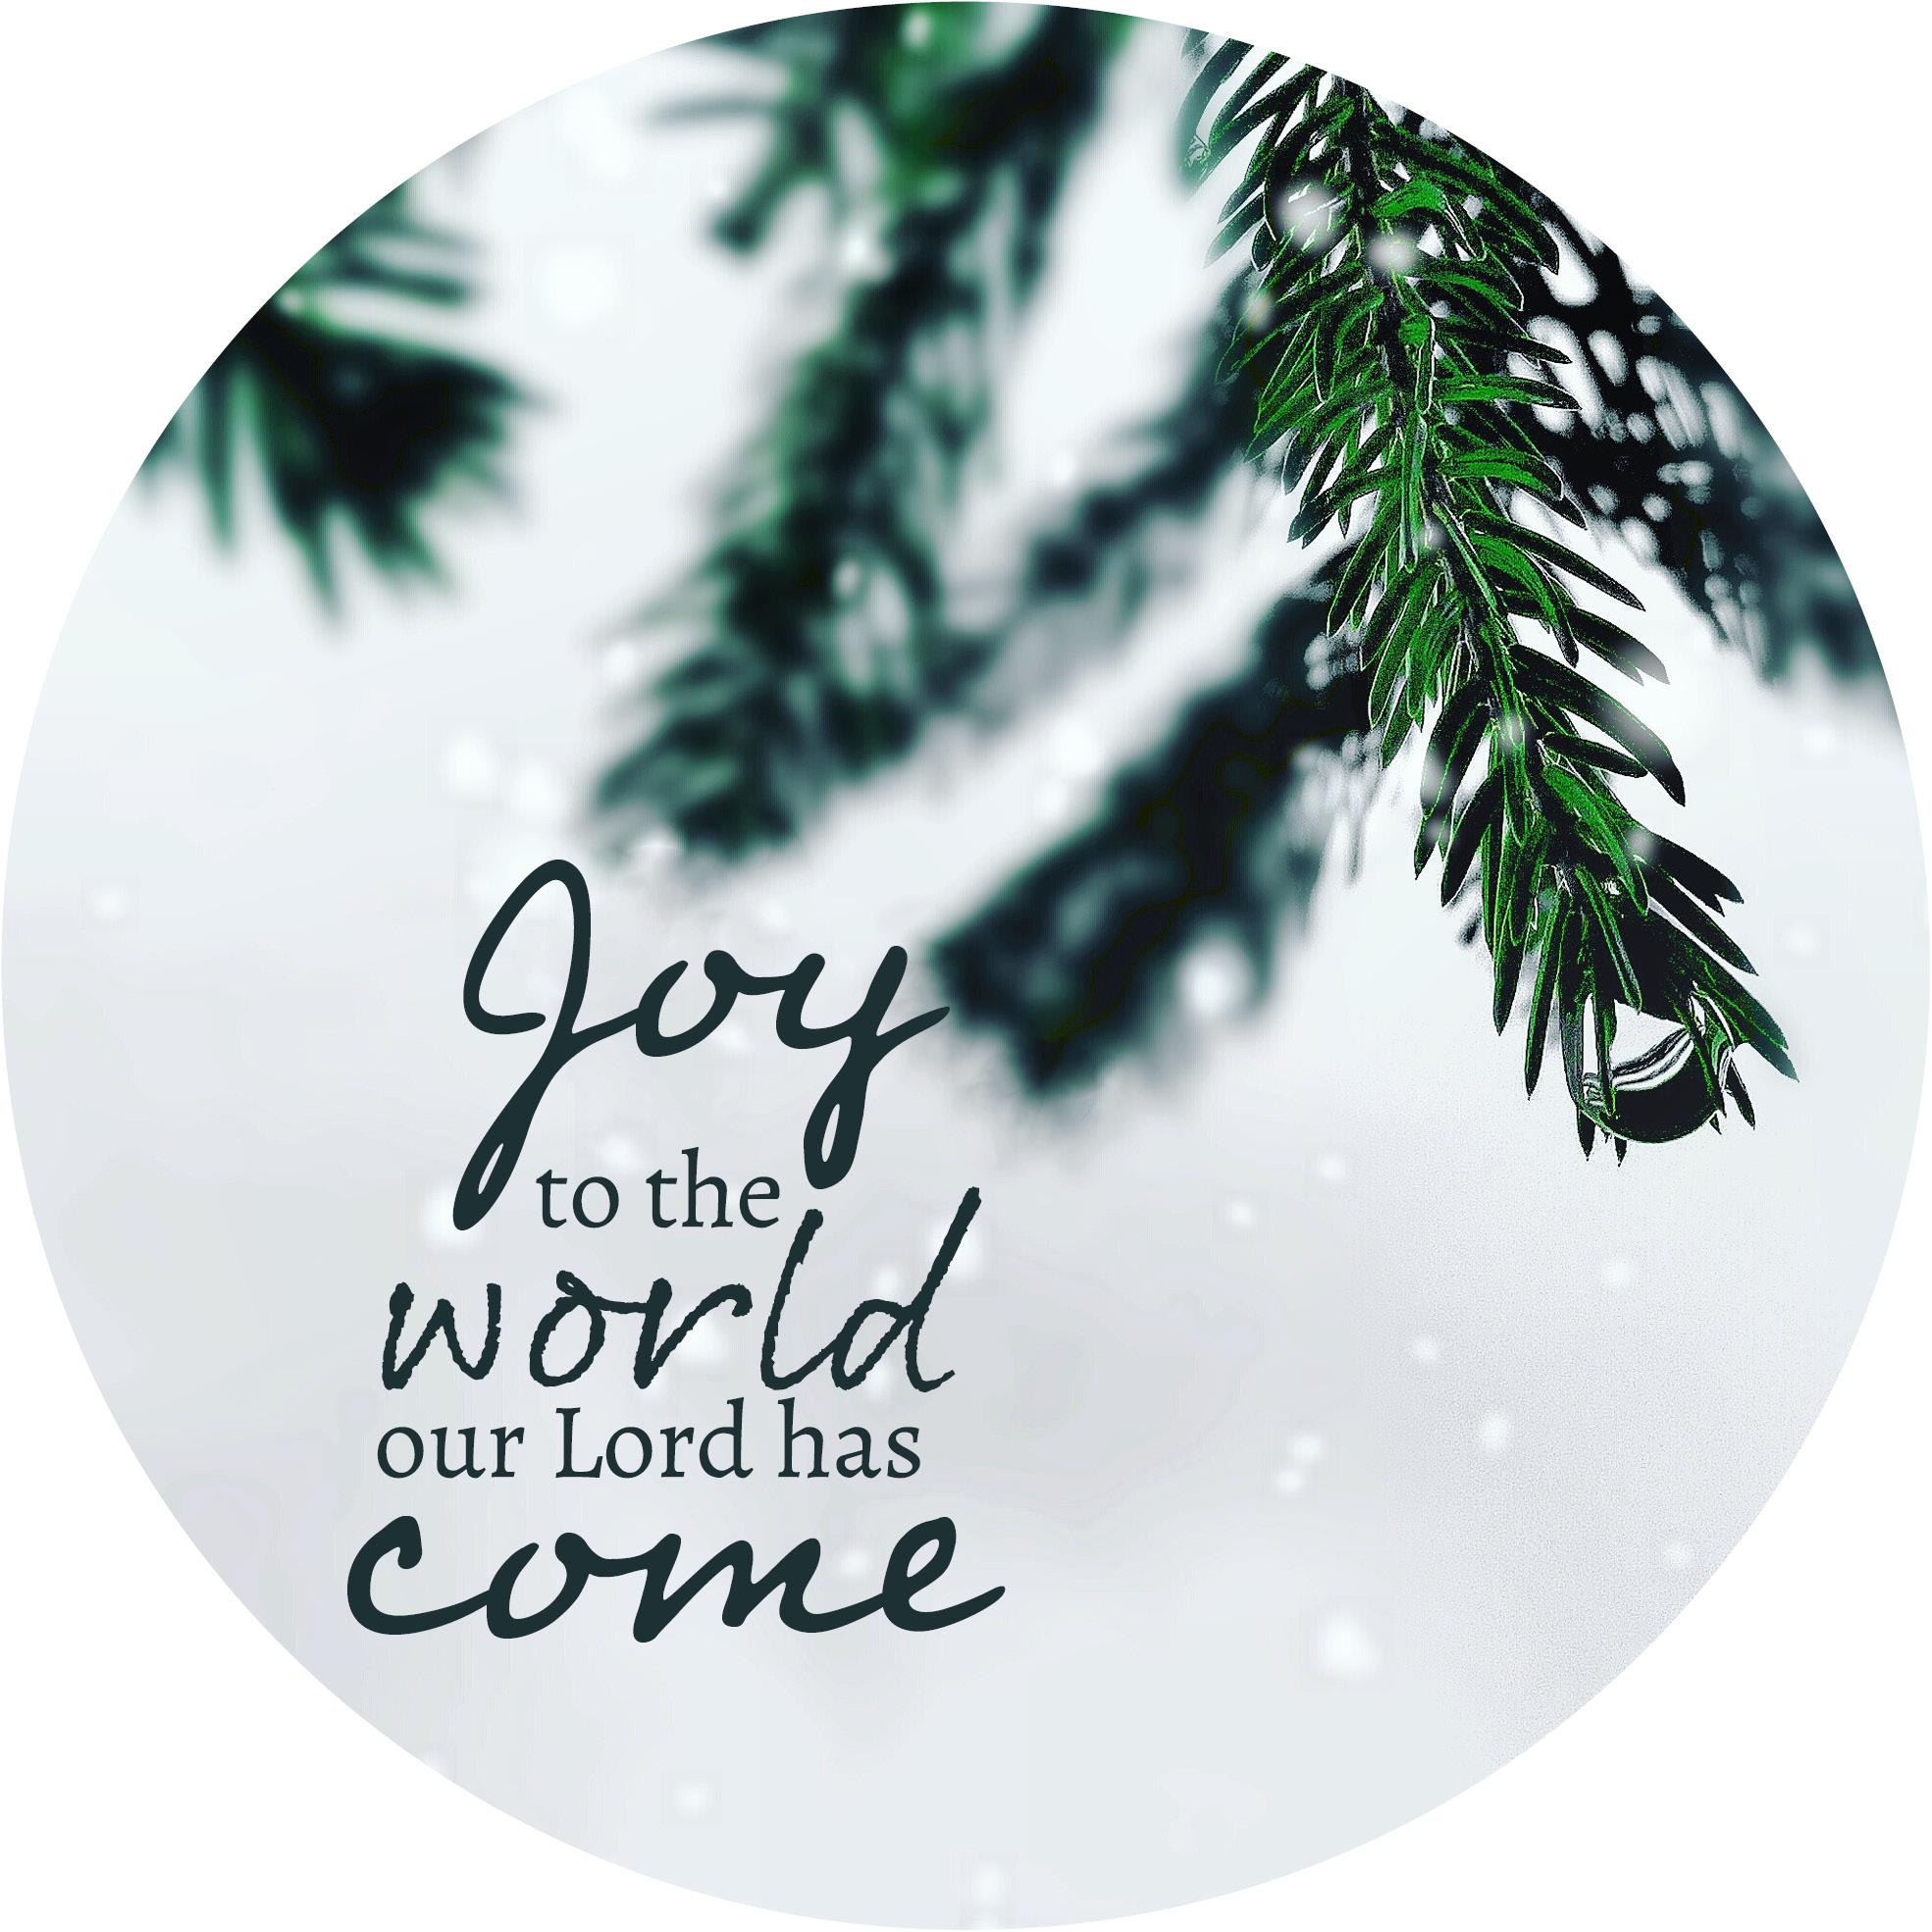 Muurcirkel Kerst Wit 25 cm - Joy to the world